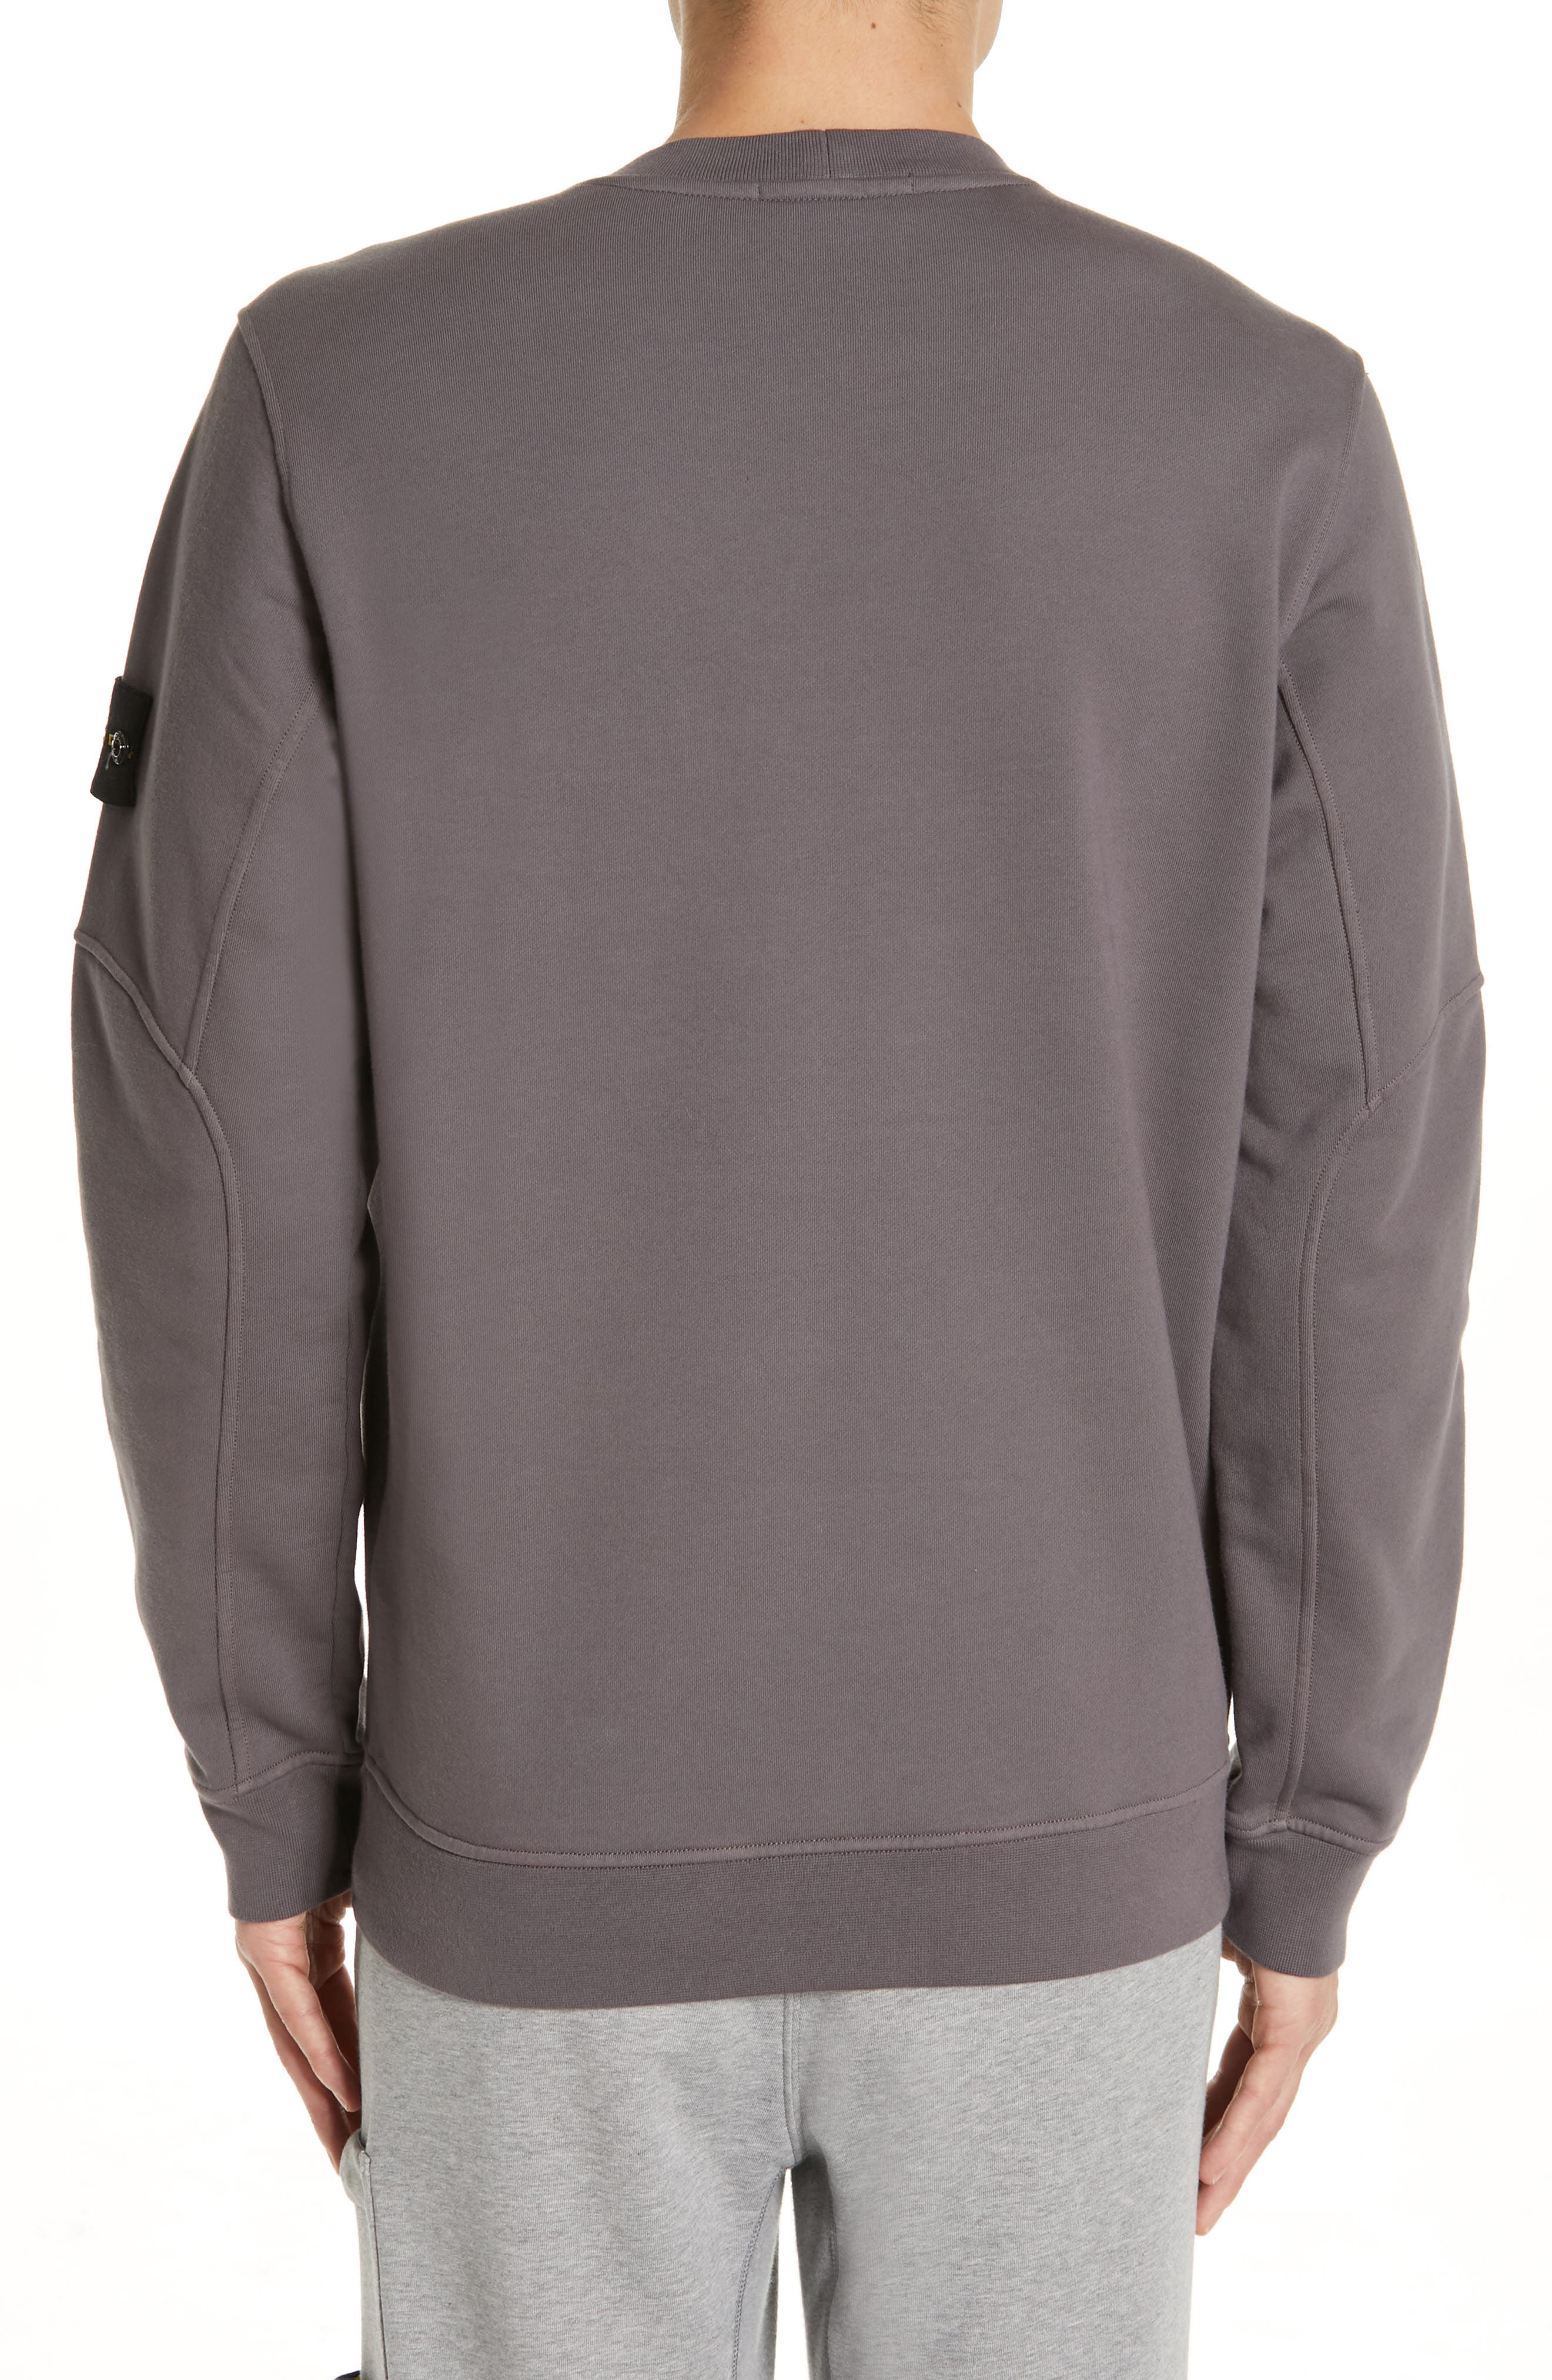 STONE ISLAND, Pocket Sweatshirt, Alternate thumbnail 2, color, BLUE